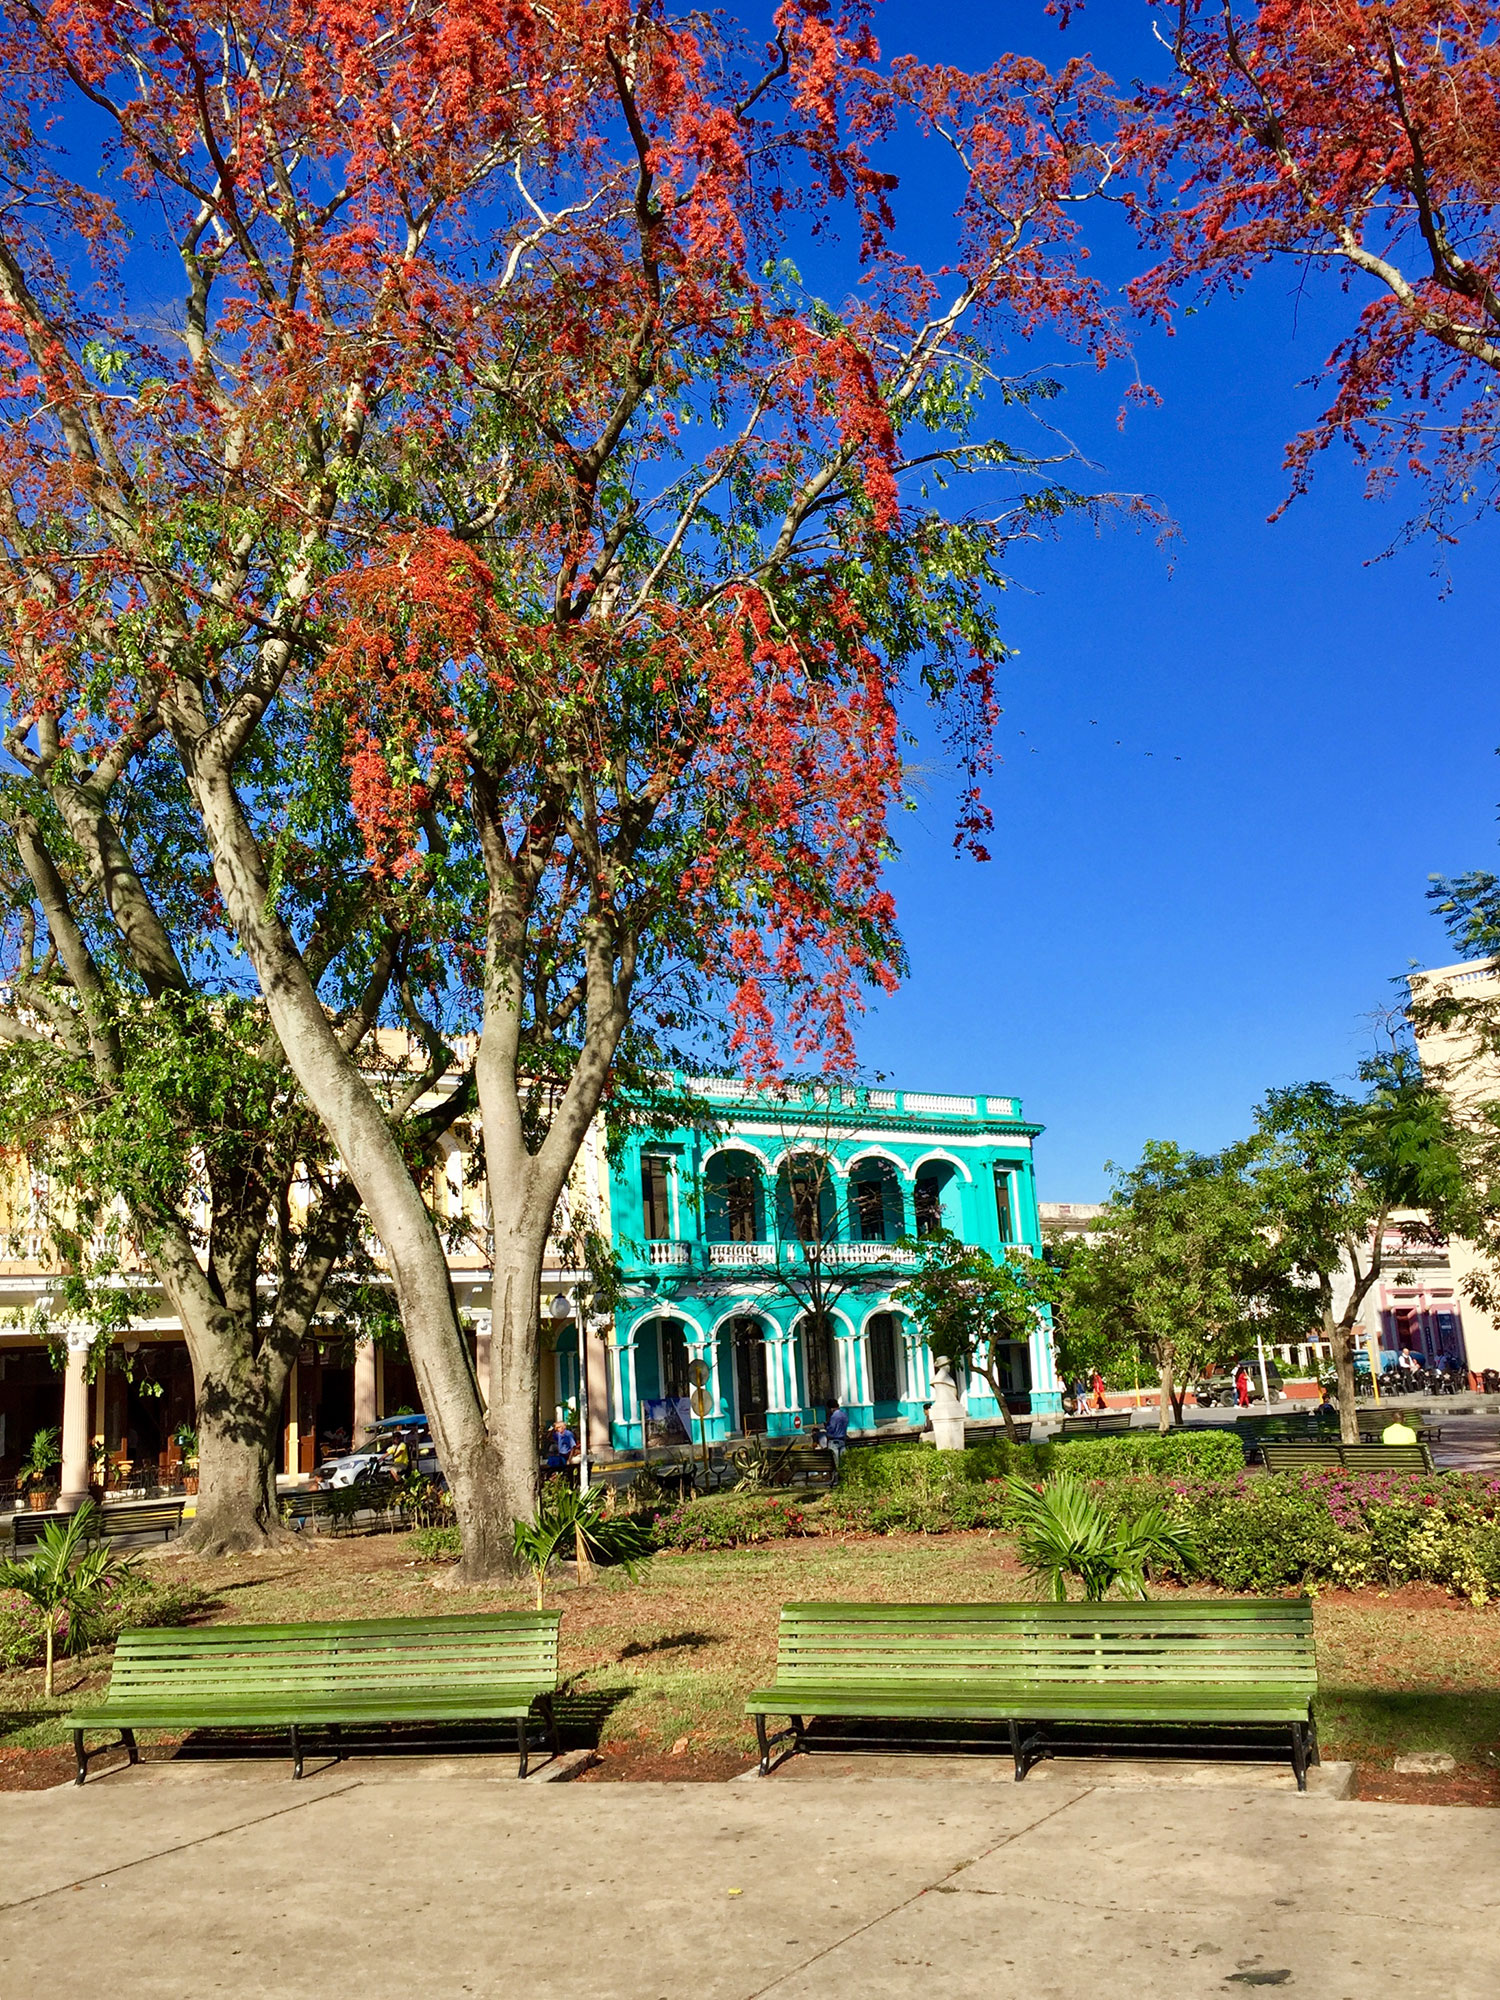 Parque Vidal at Santa Clara.